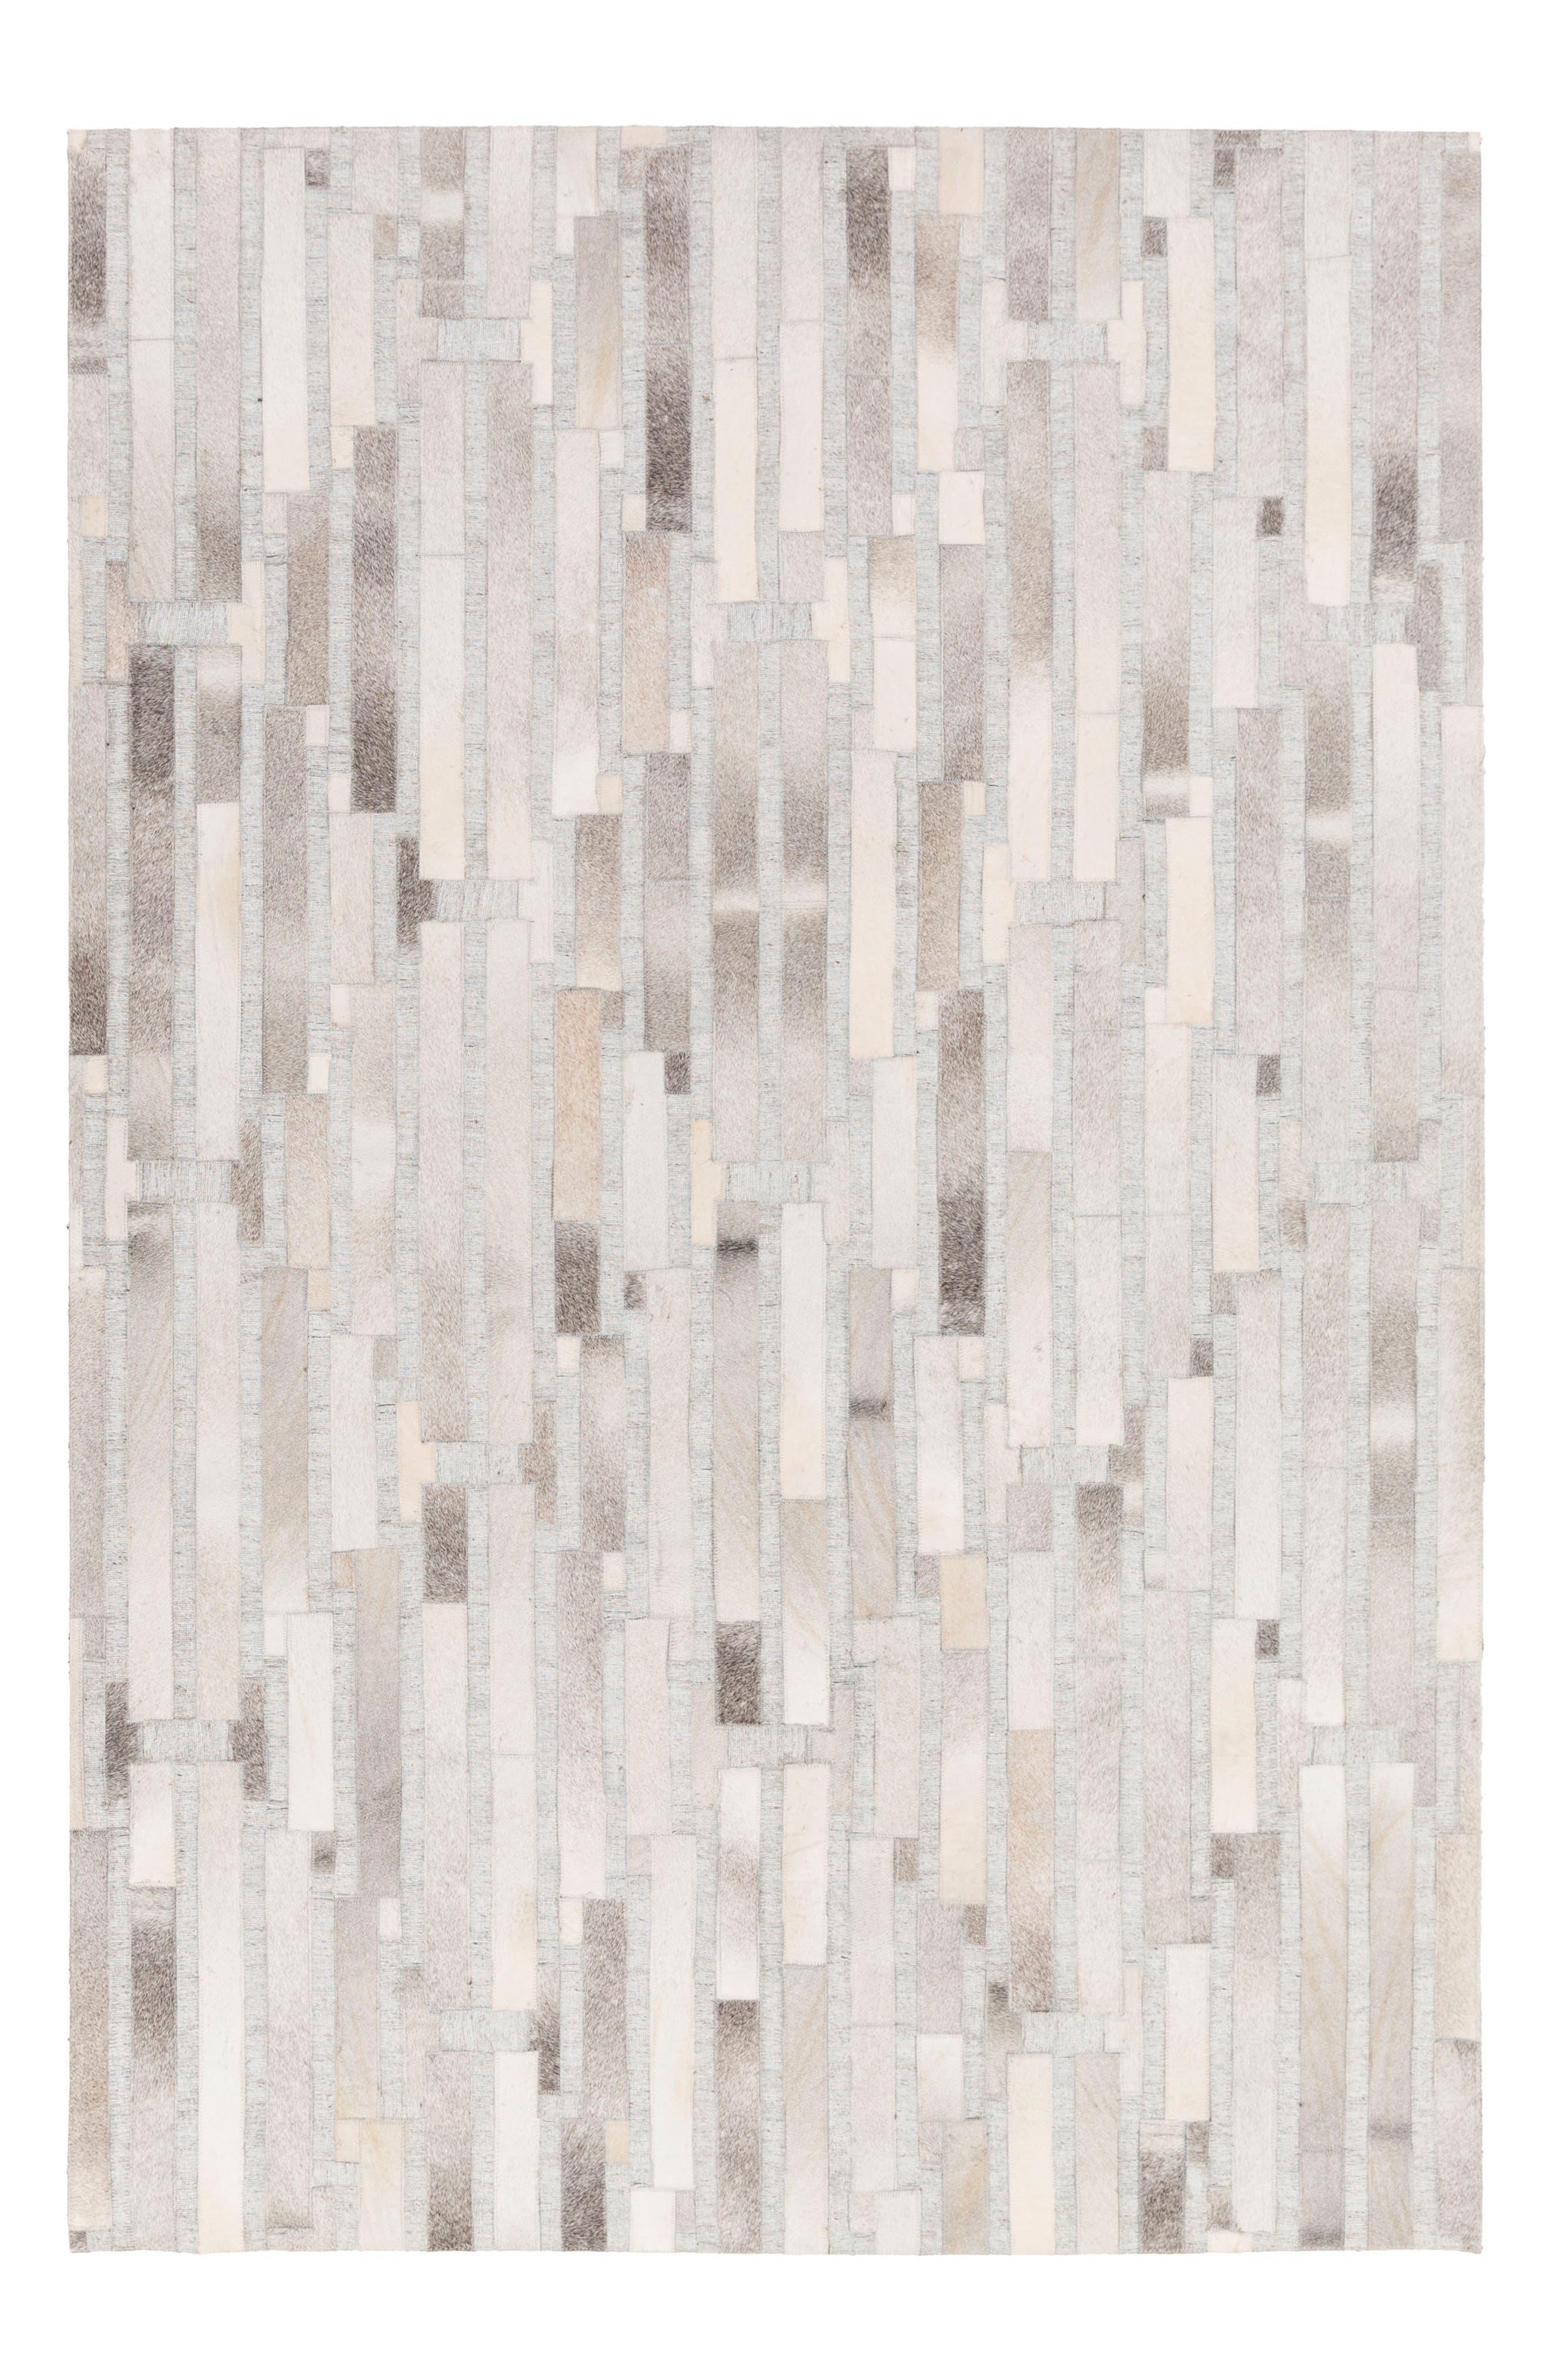 Medora Bark Hand Stitched Rug,                         Main,                         color, Grey/ Cream